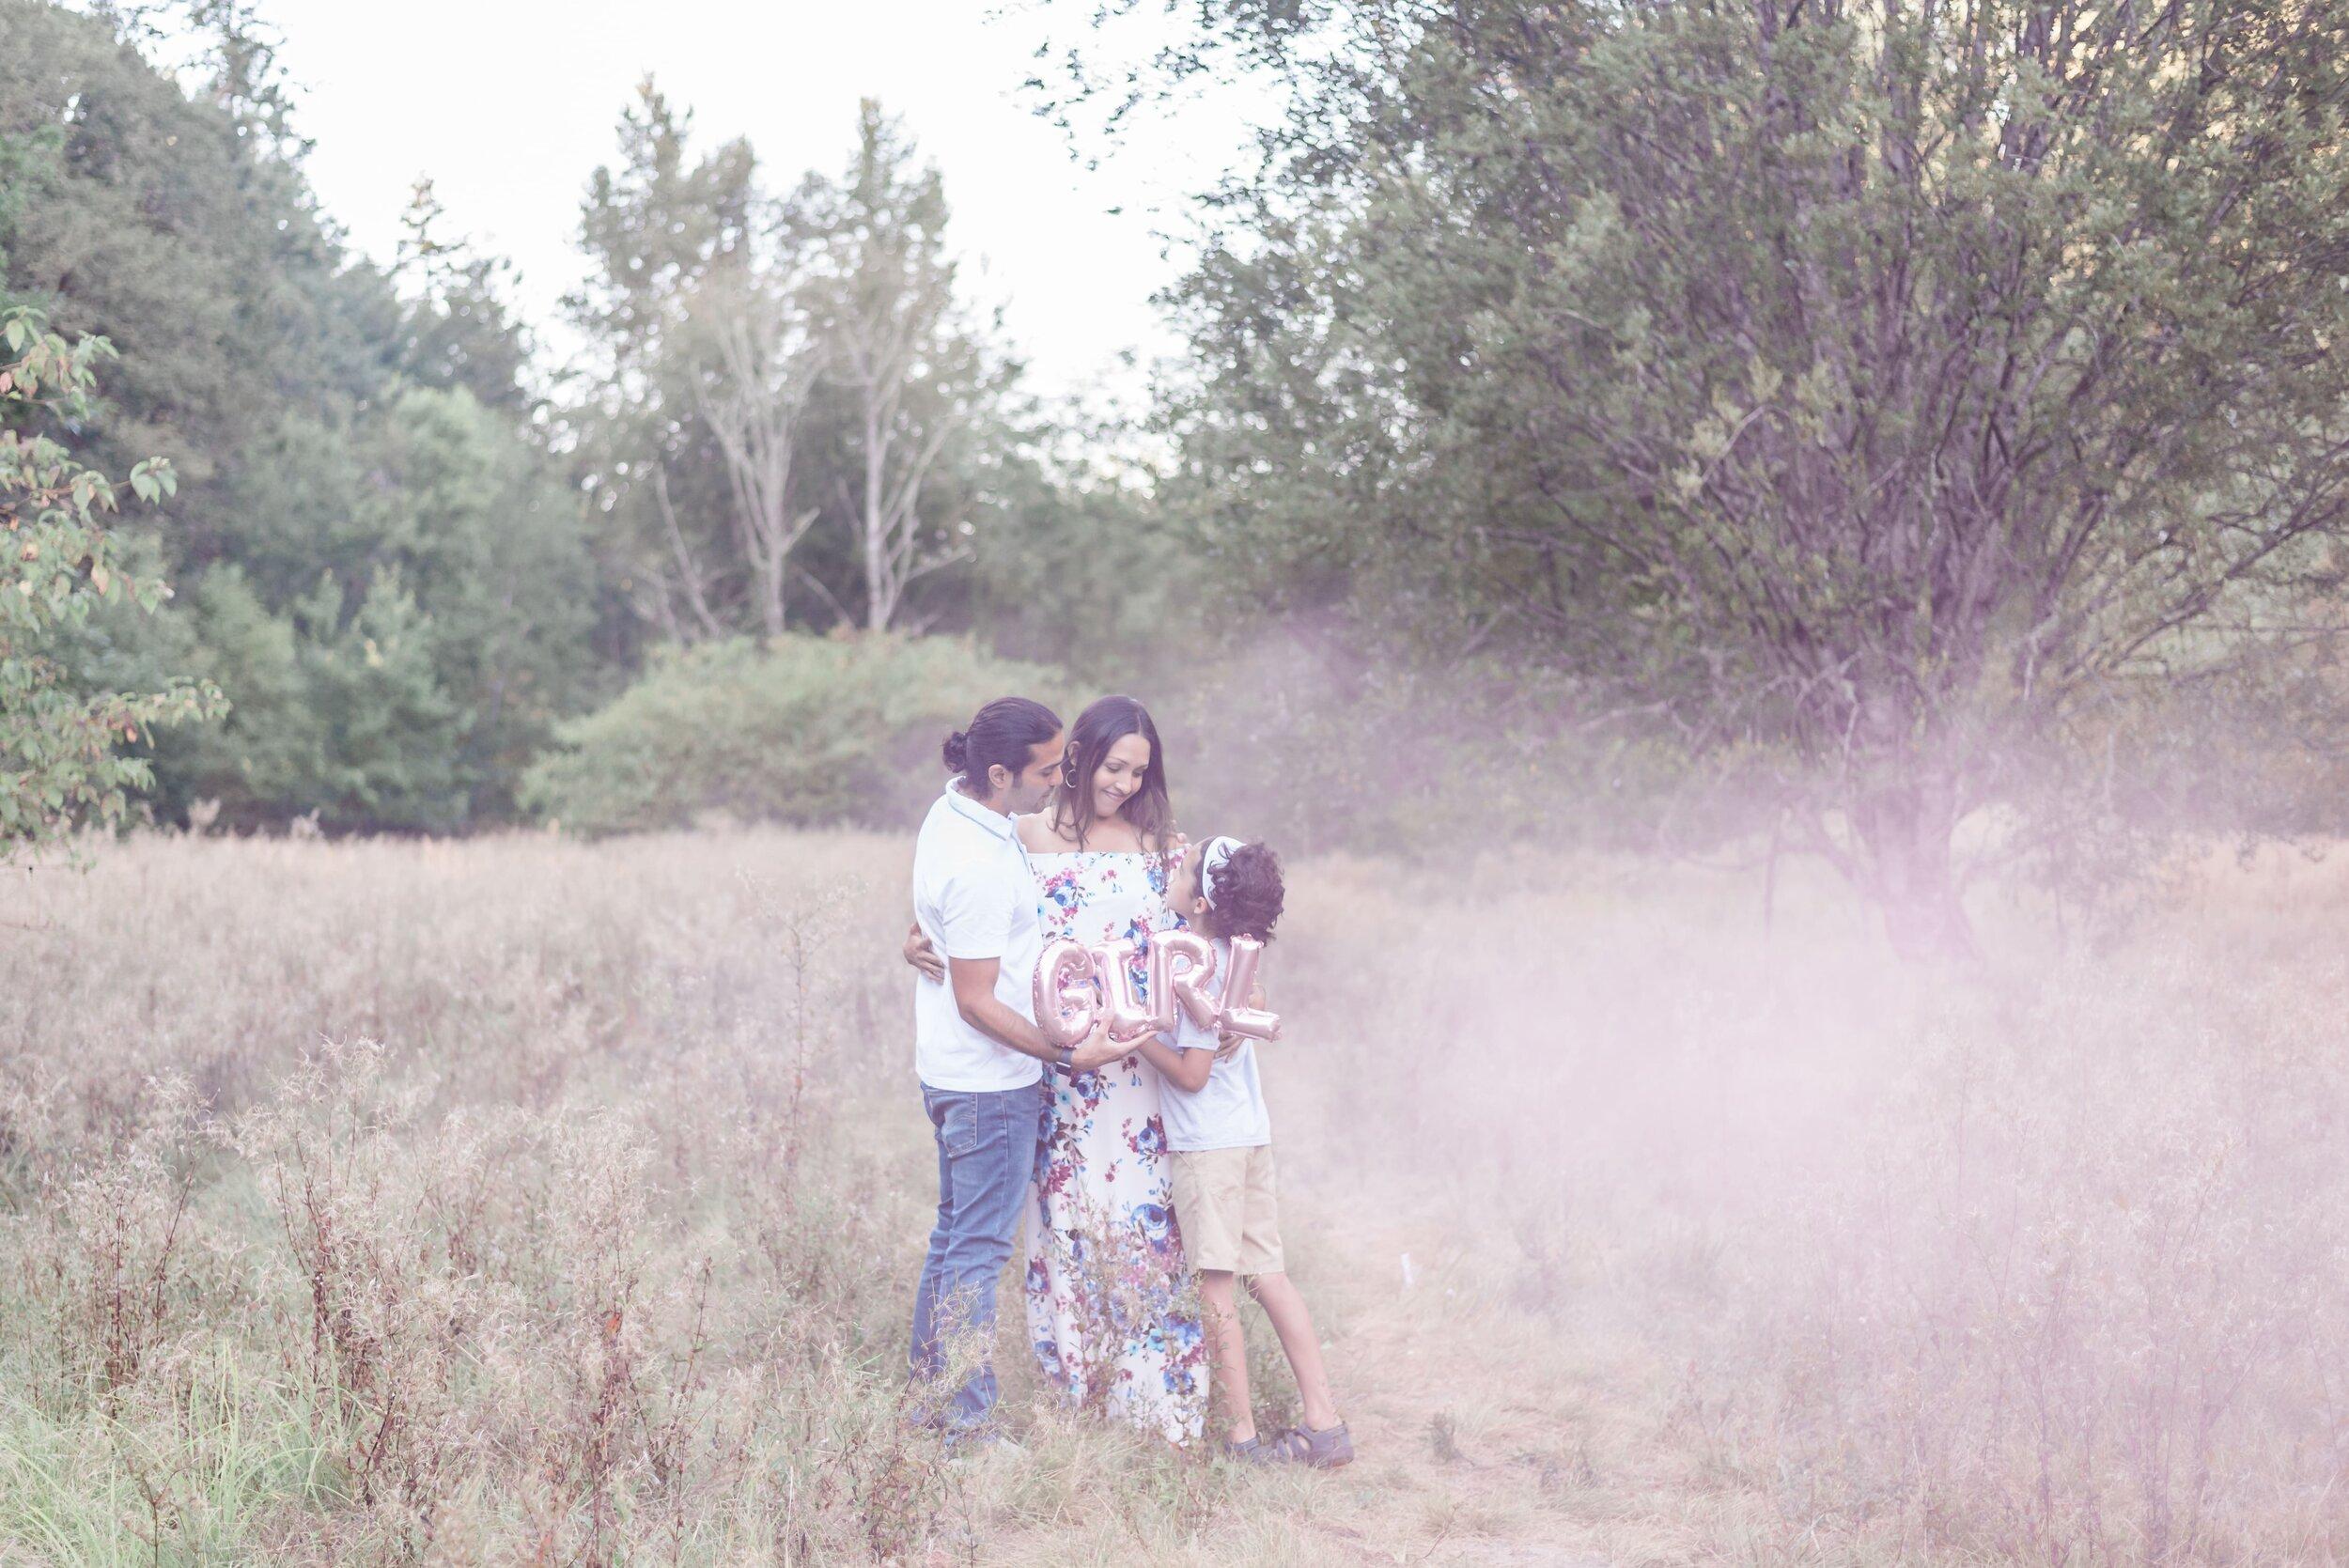 Gender Reveal Smoke Cannon| Elizabeth Hite Photography  gender reveal ideas, ideas for gender reveal, gender reveal party, surprise gender reveal, Portland Oregon